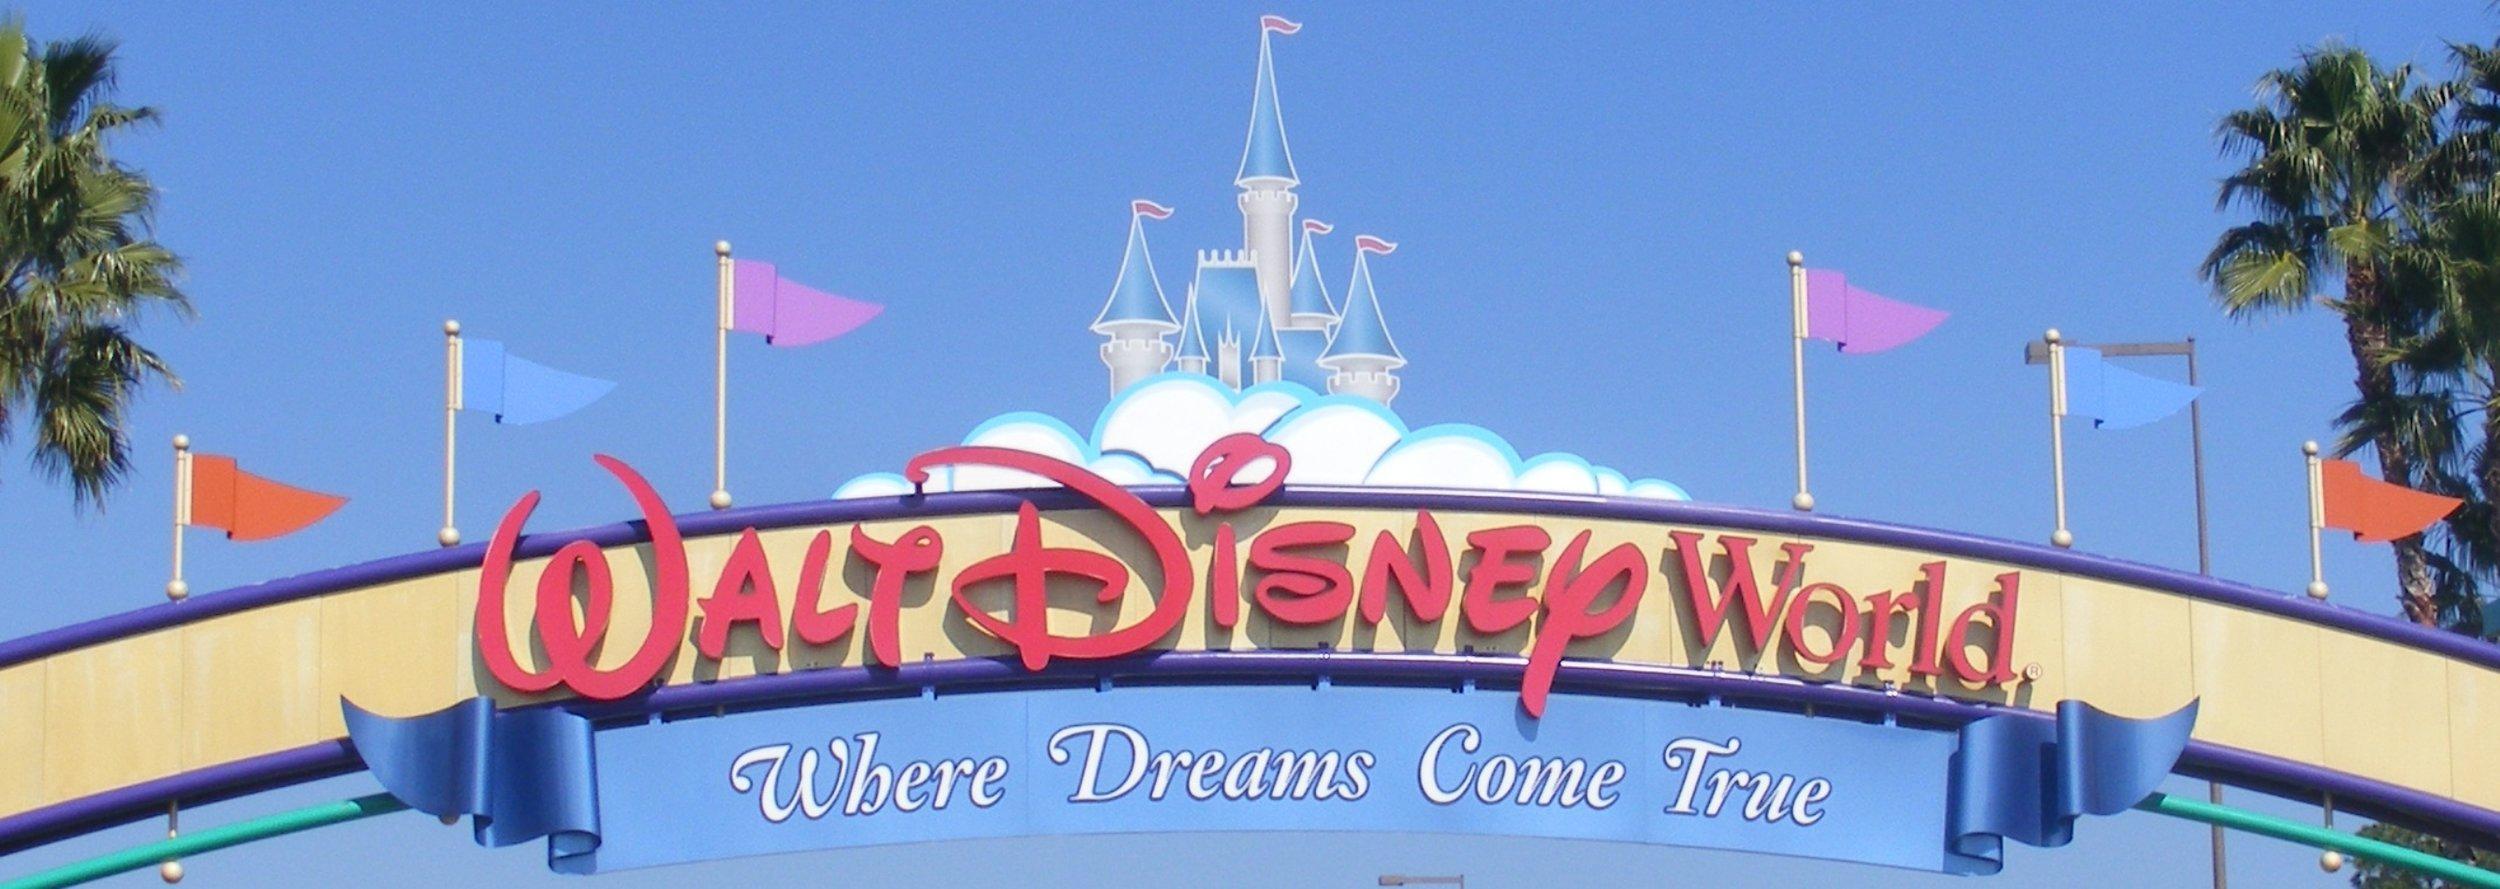 Walt Disney World Entrance Sign.jpg